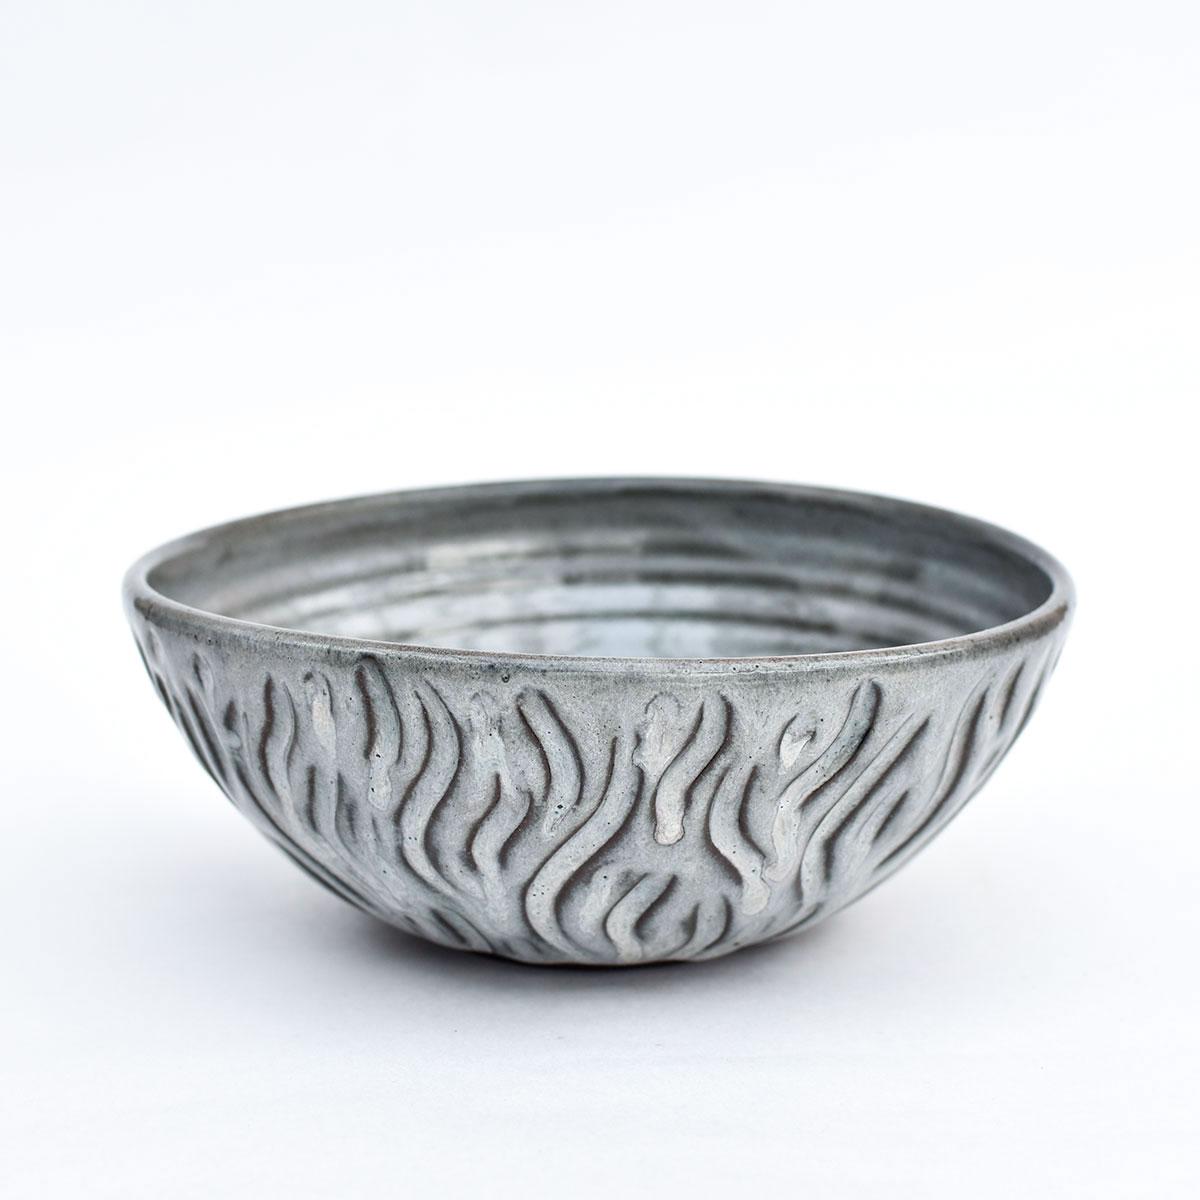 картинка Керамический салатник Натальи Астаховой 1 - DishWishes.Ru